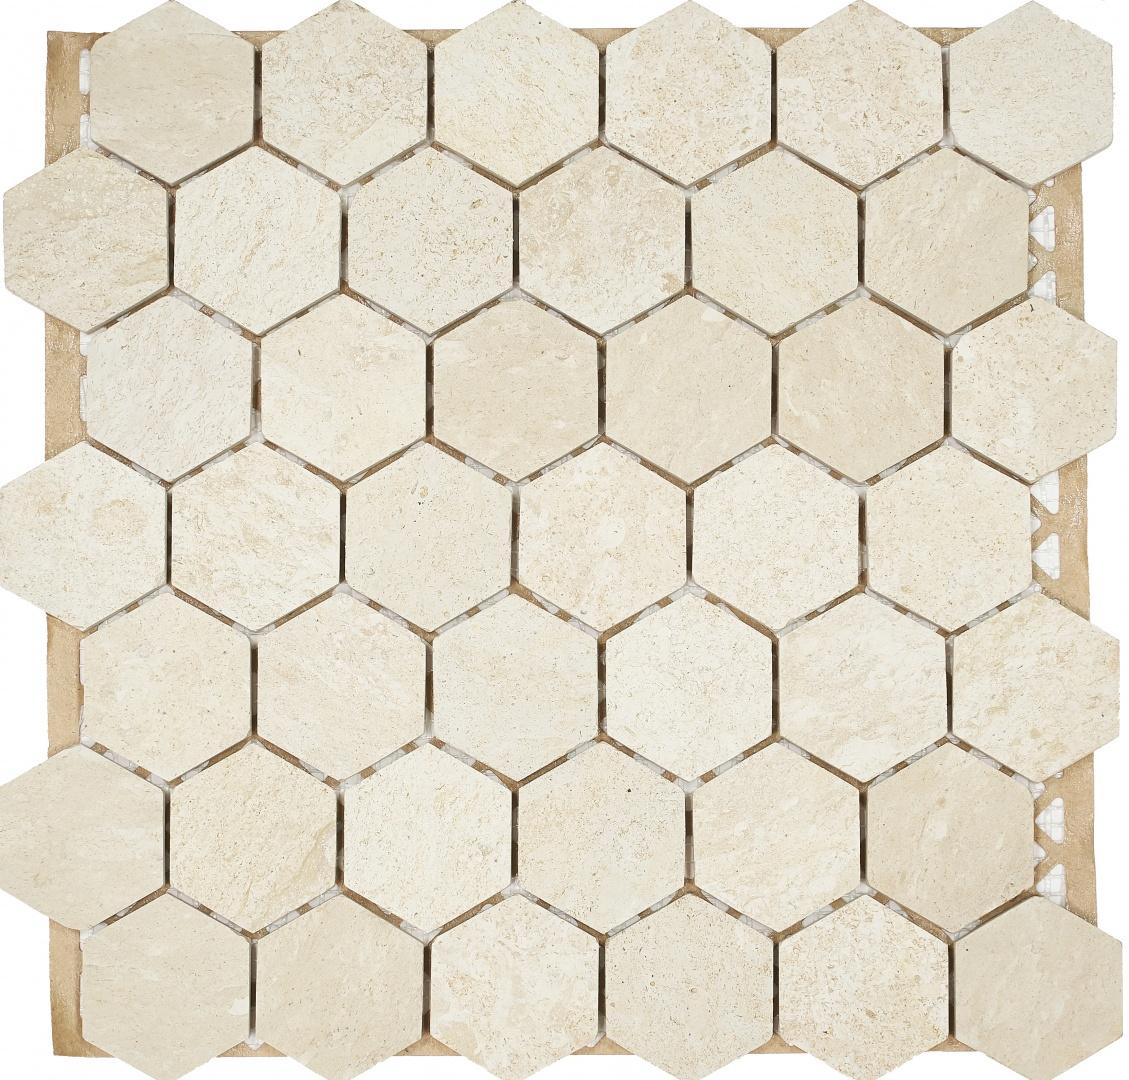 Мозаика Pietrine Biege Hexagon 30128 48х48х7мм